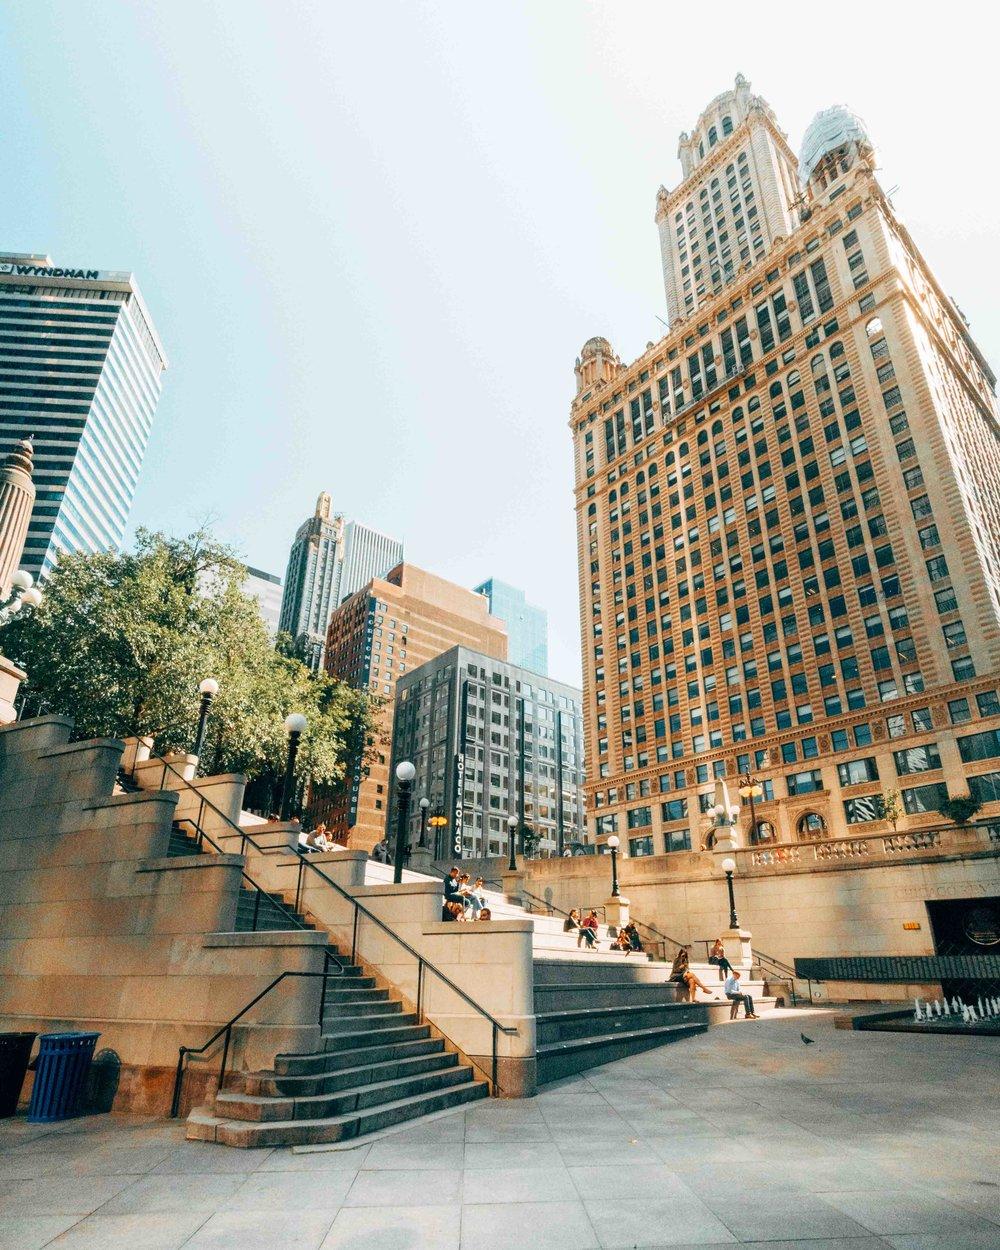 36-hours-in-chicago-riverwalk-3